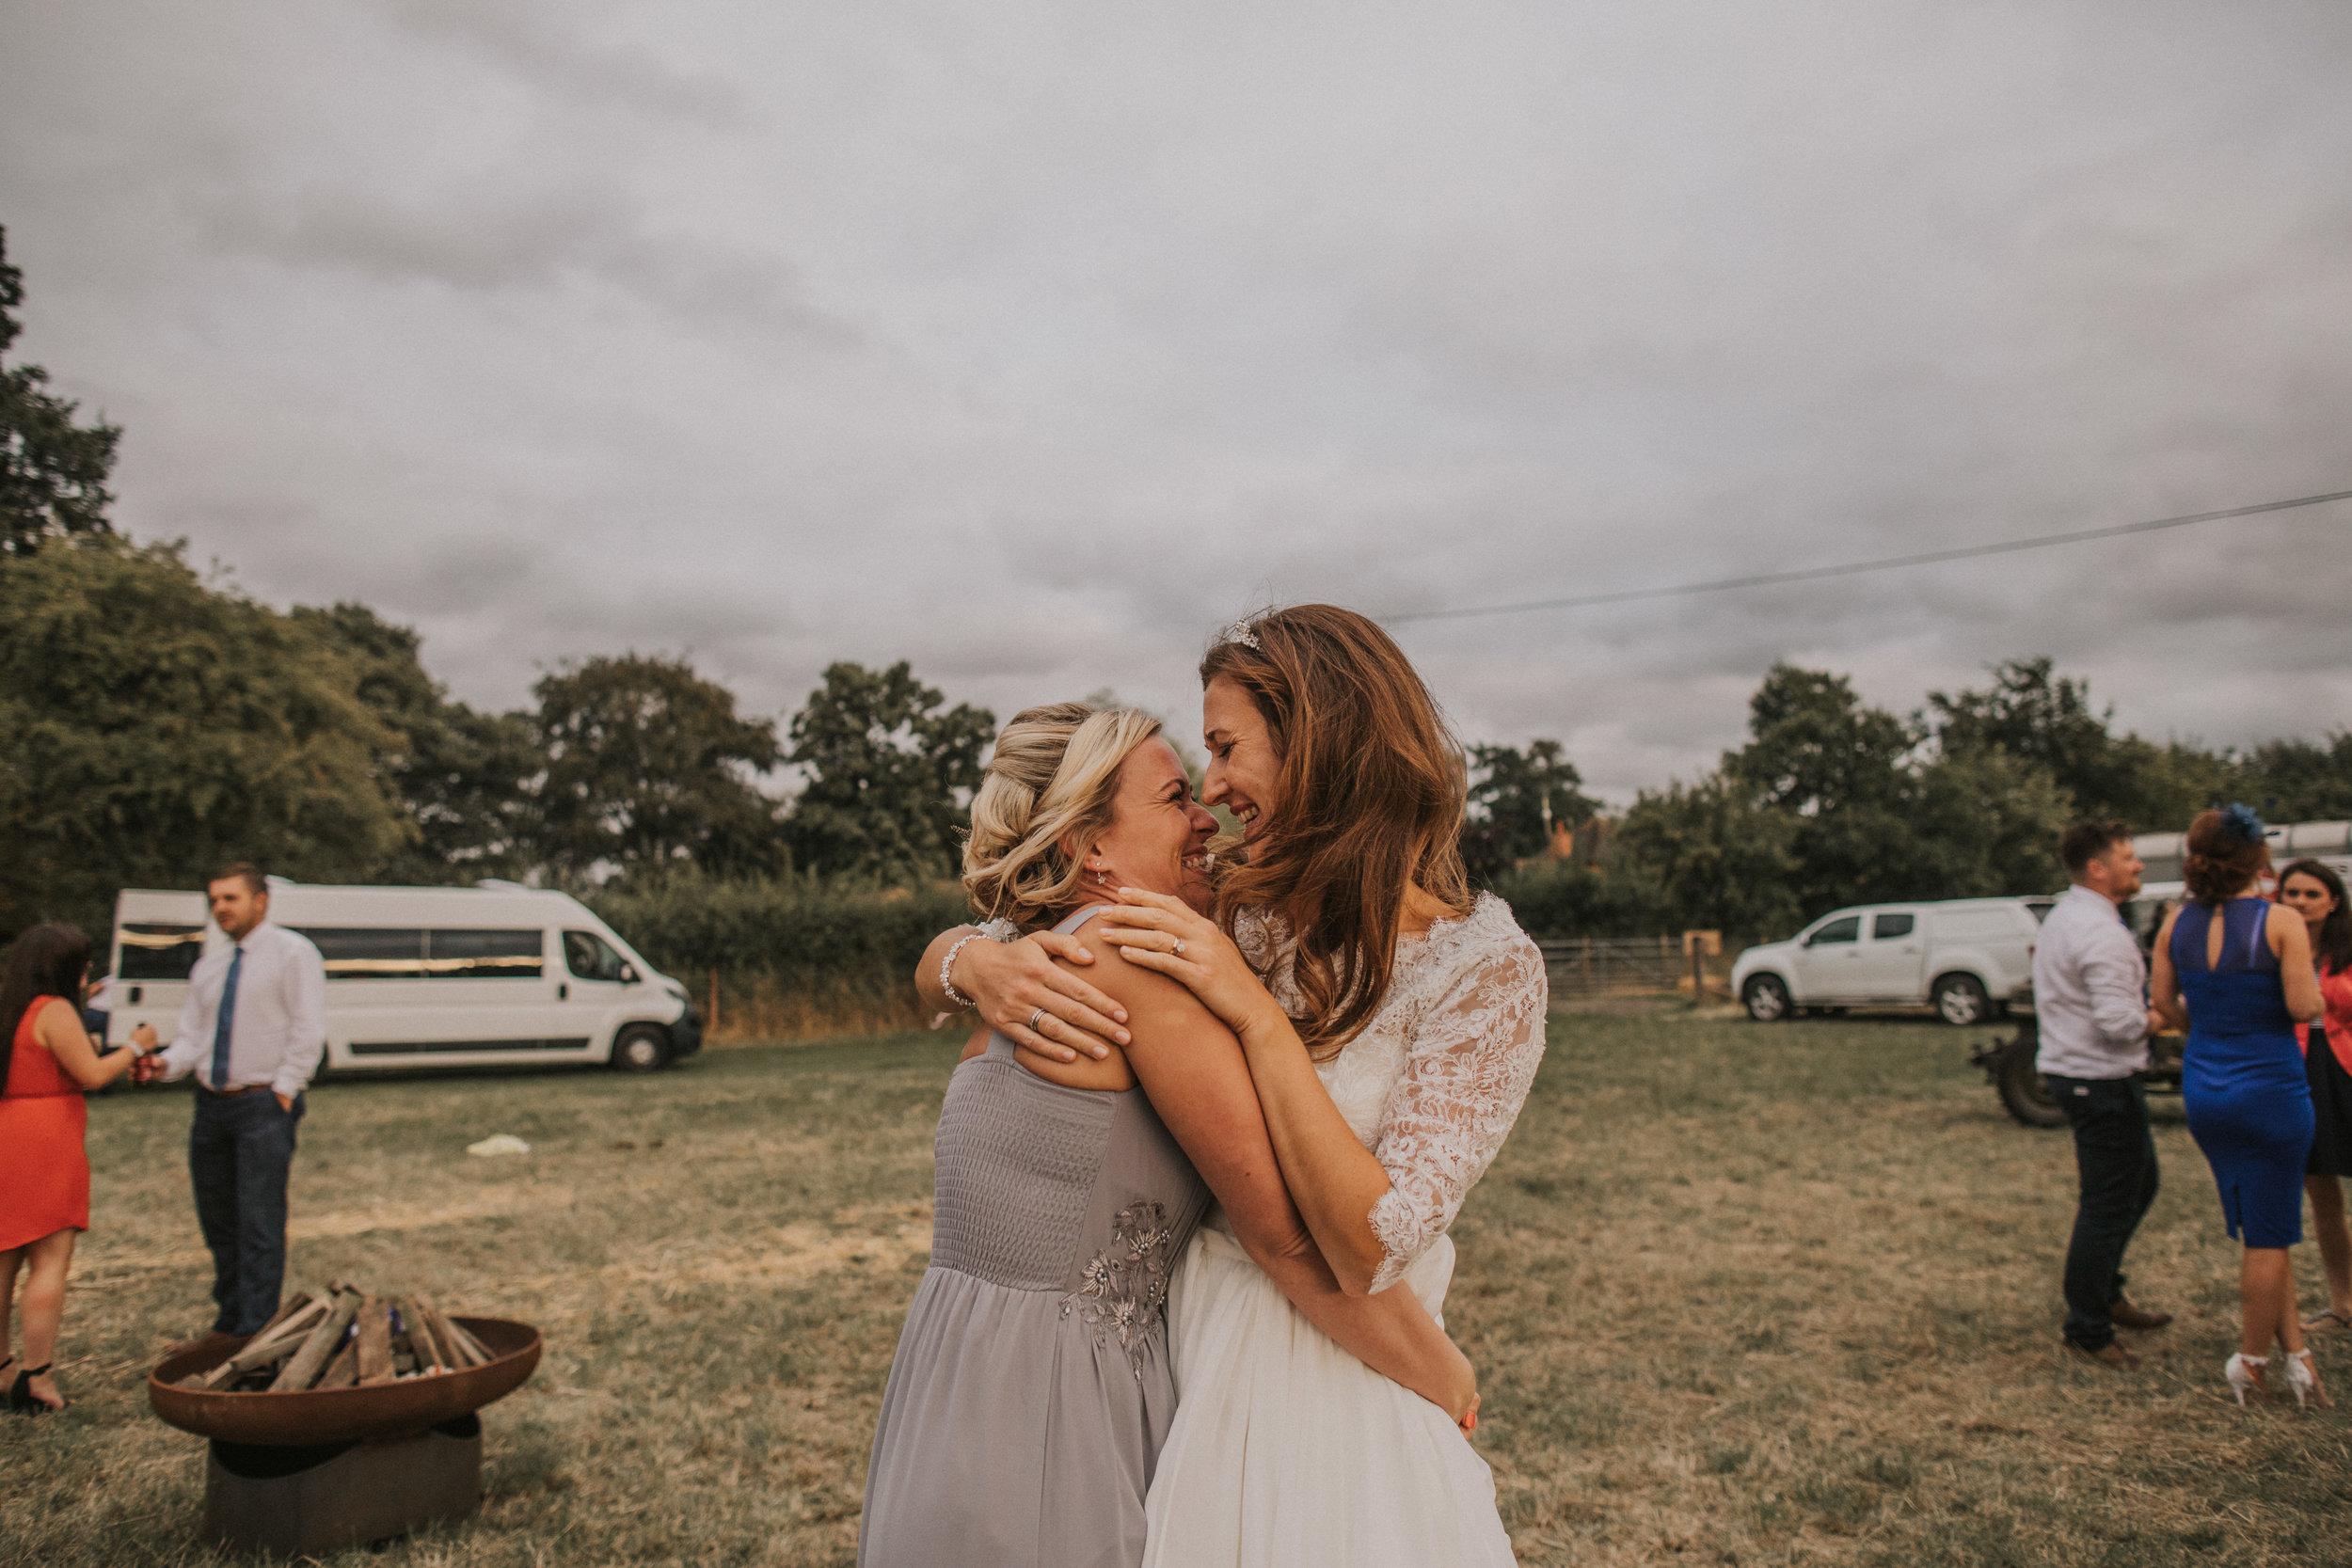 brook rose photography  Farm wedding_110.jpg